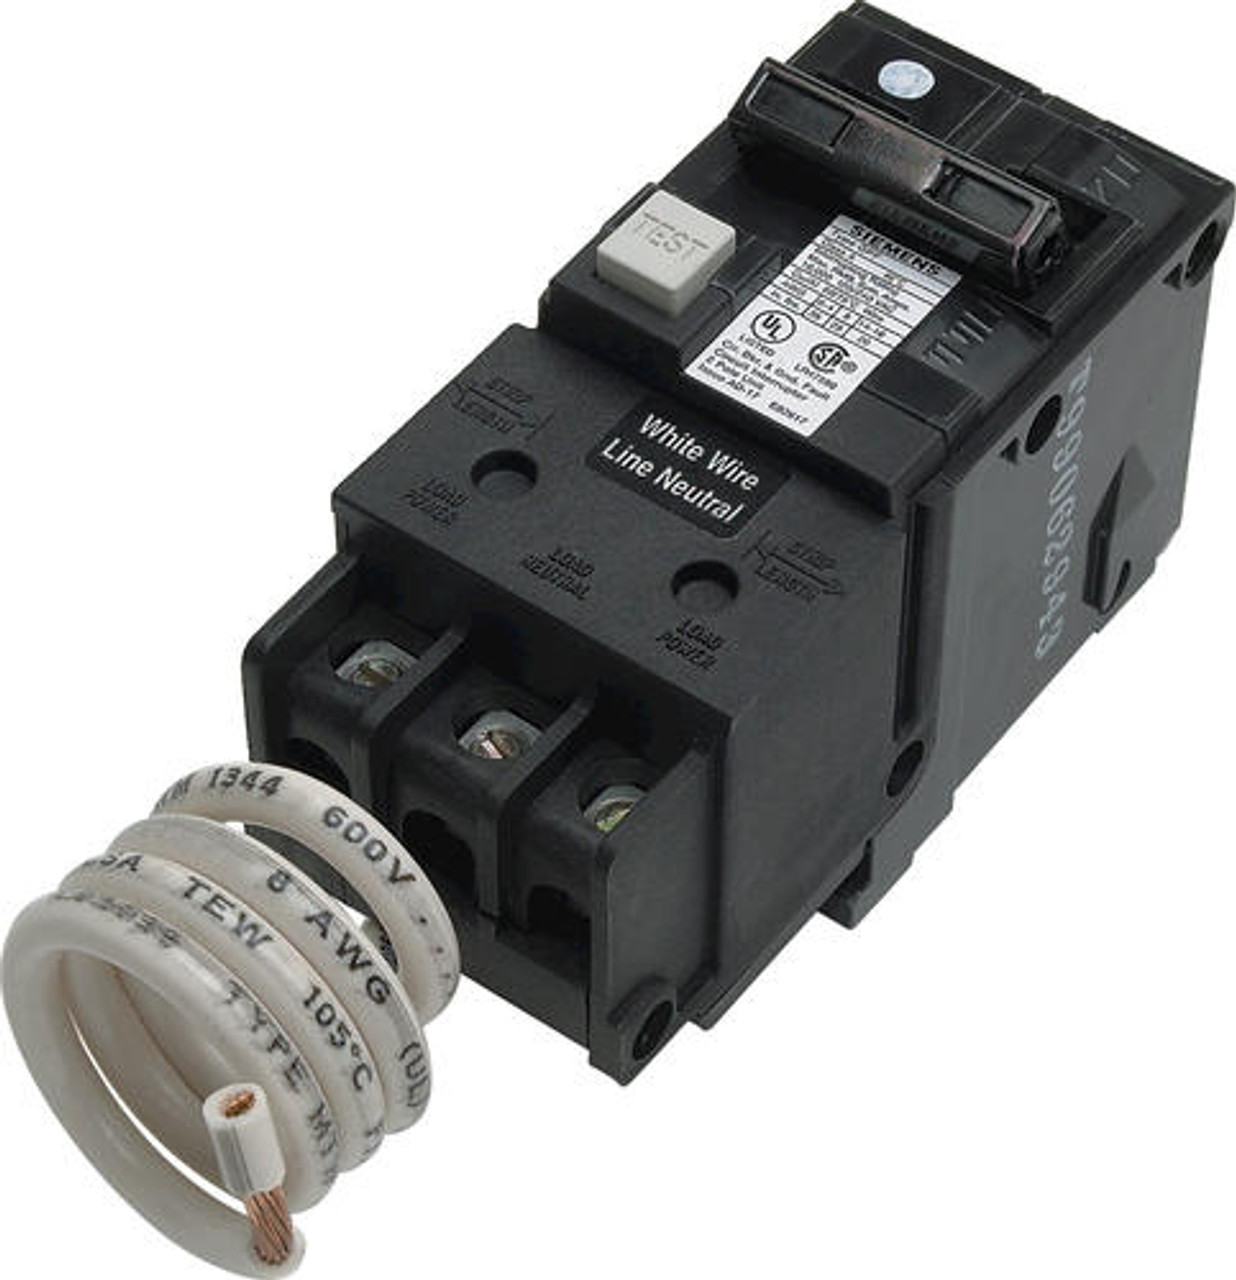 hight resolution of siemens 40 amp gfci double pole breaker in canada siemens gfci breaker wiring